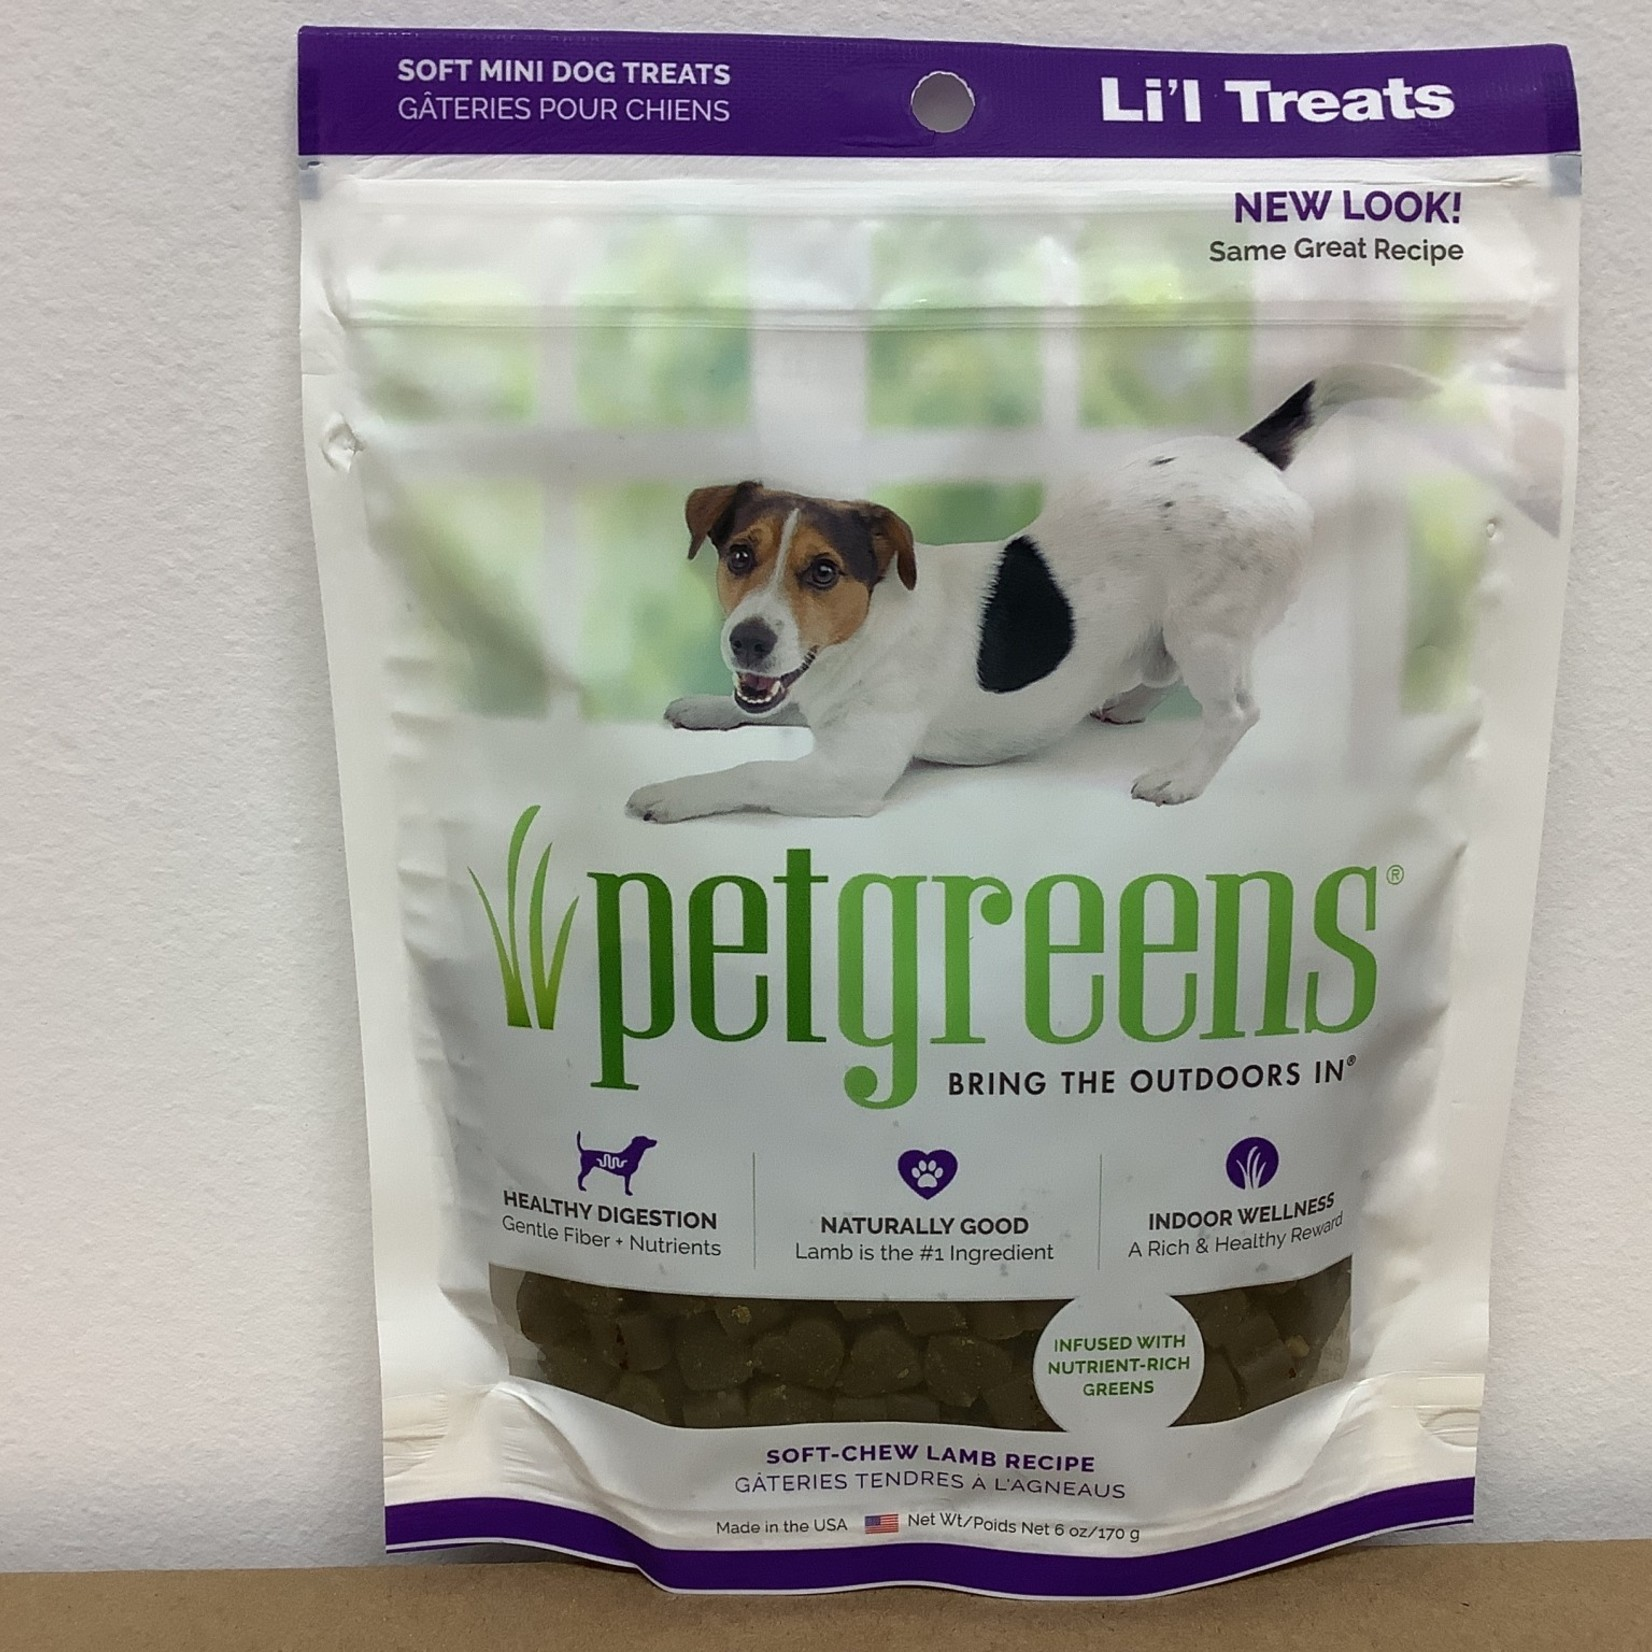 BellRock 4 flavors-Soft-Chew 170 g - Dog PetGreens Treats